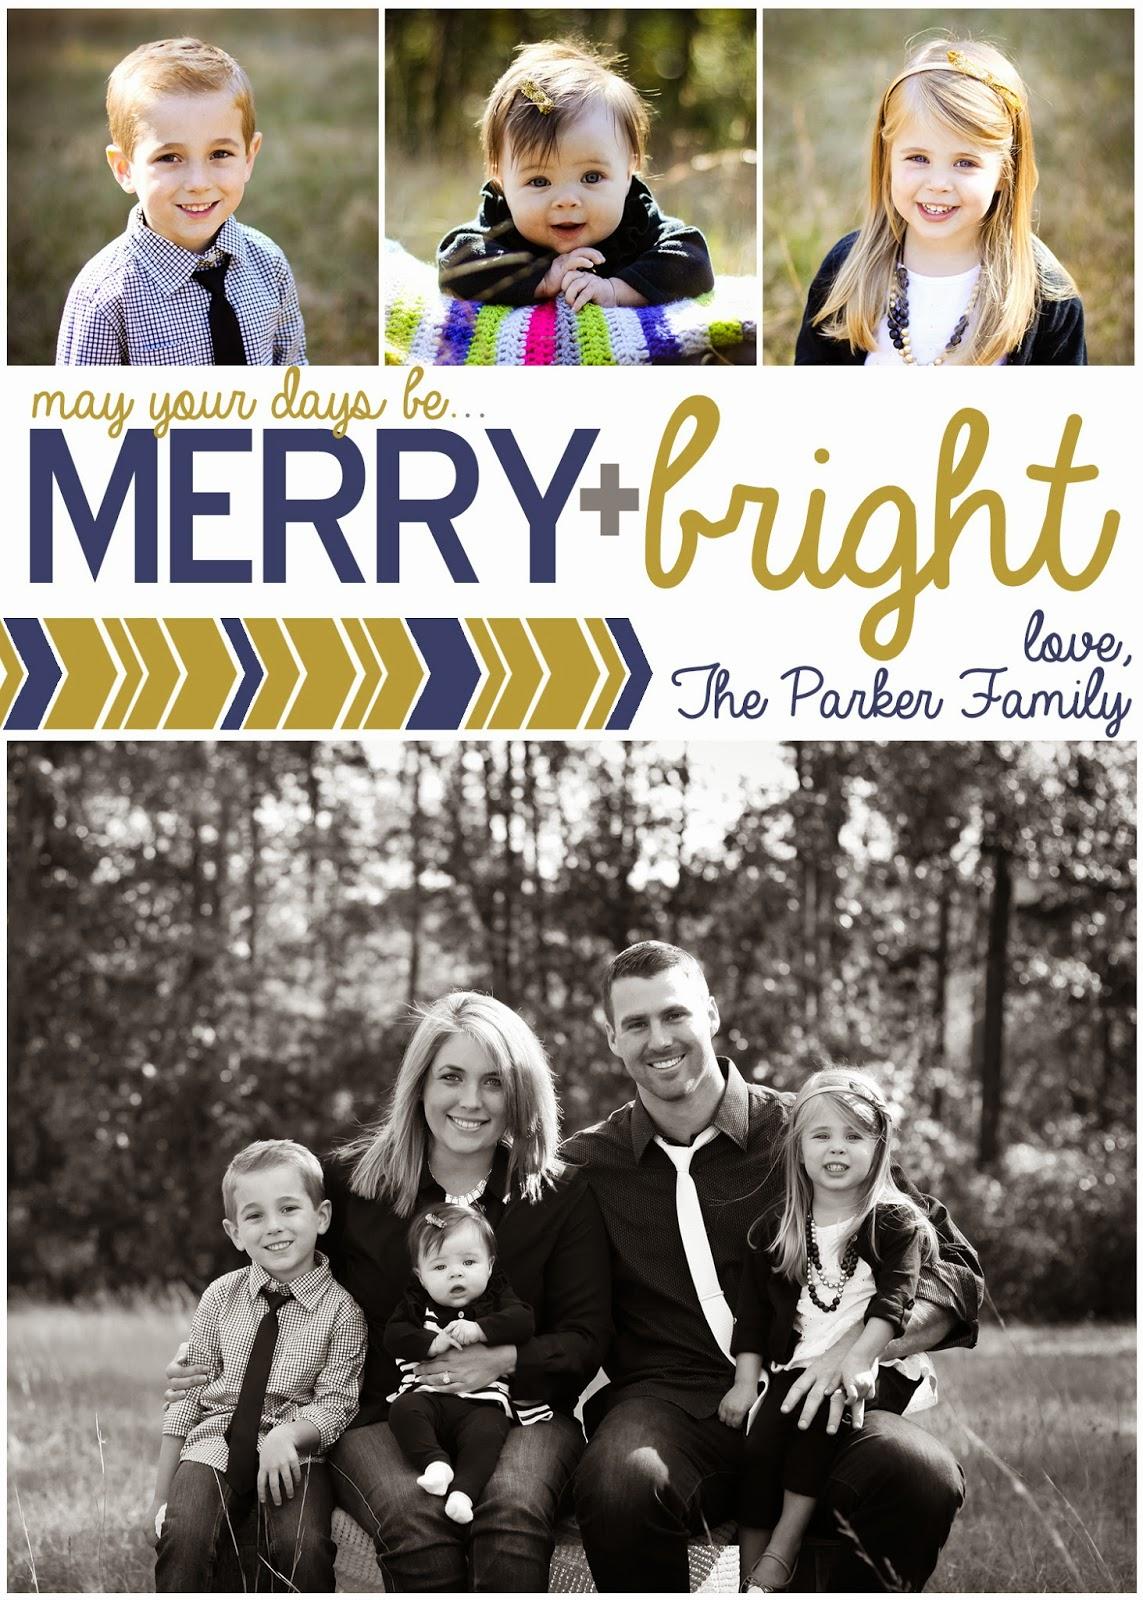 Christmas Card Roll Call 2014